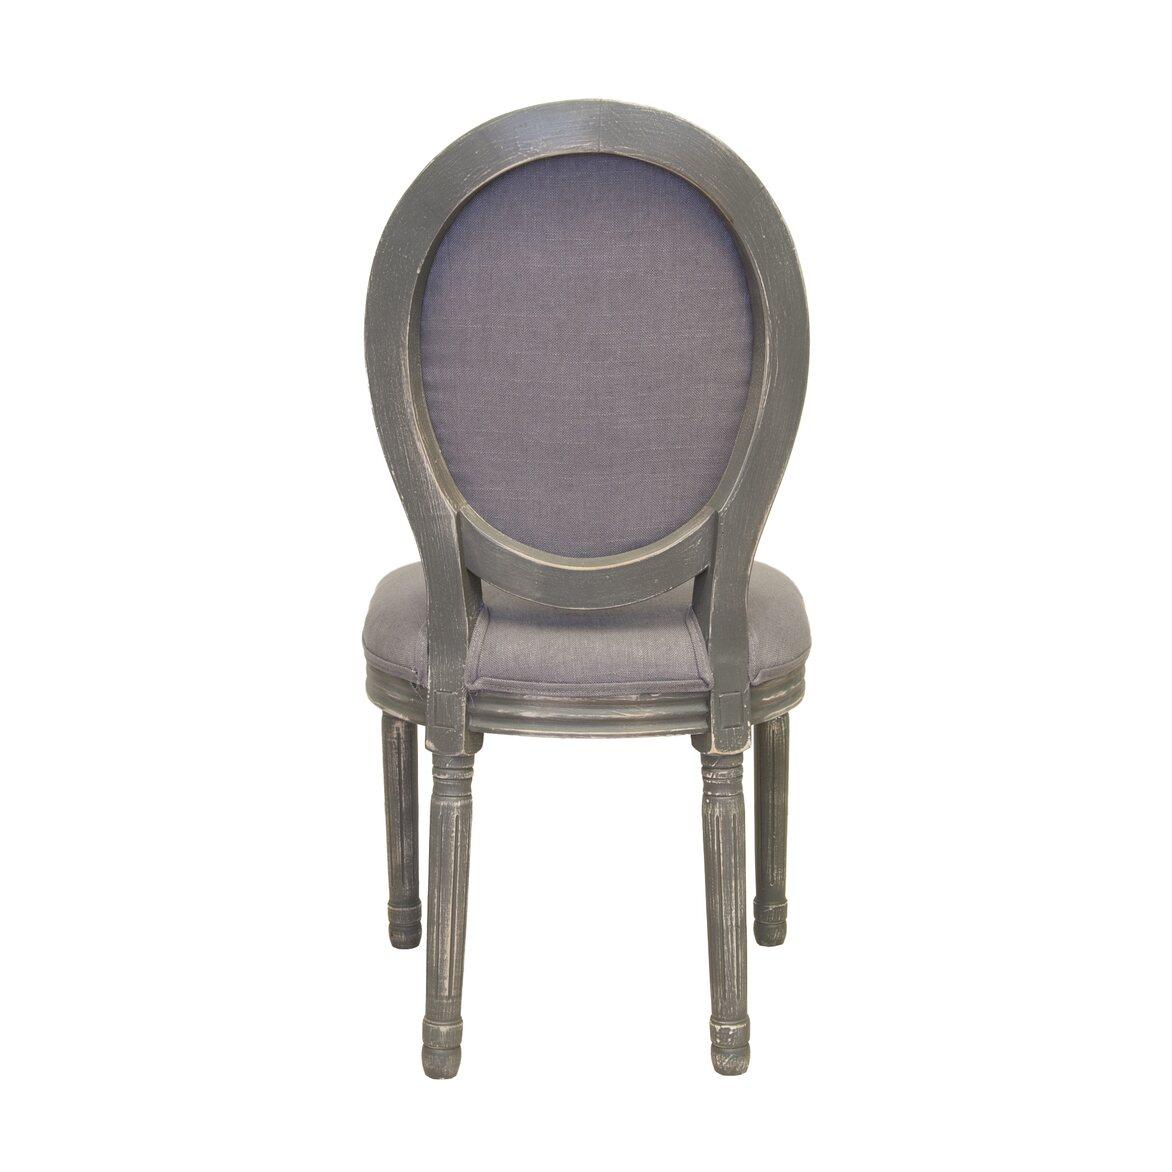 Стул Volker button grey 3 | Обеденные стулья Kingsby